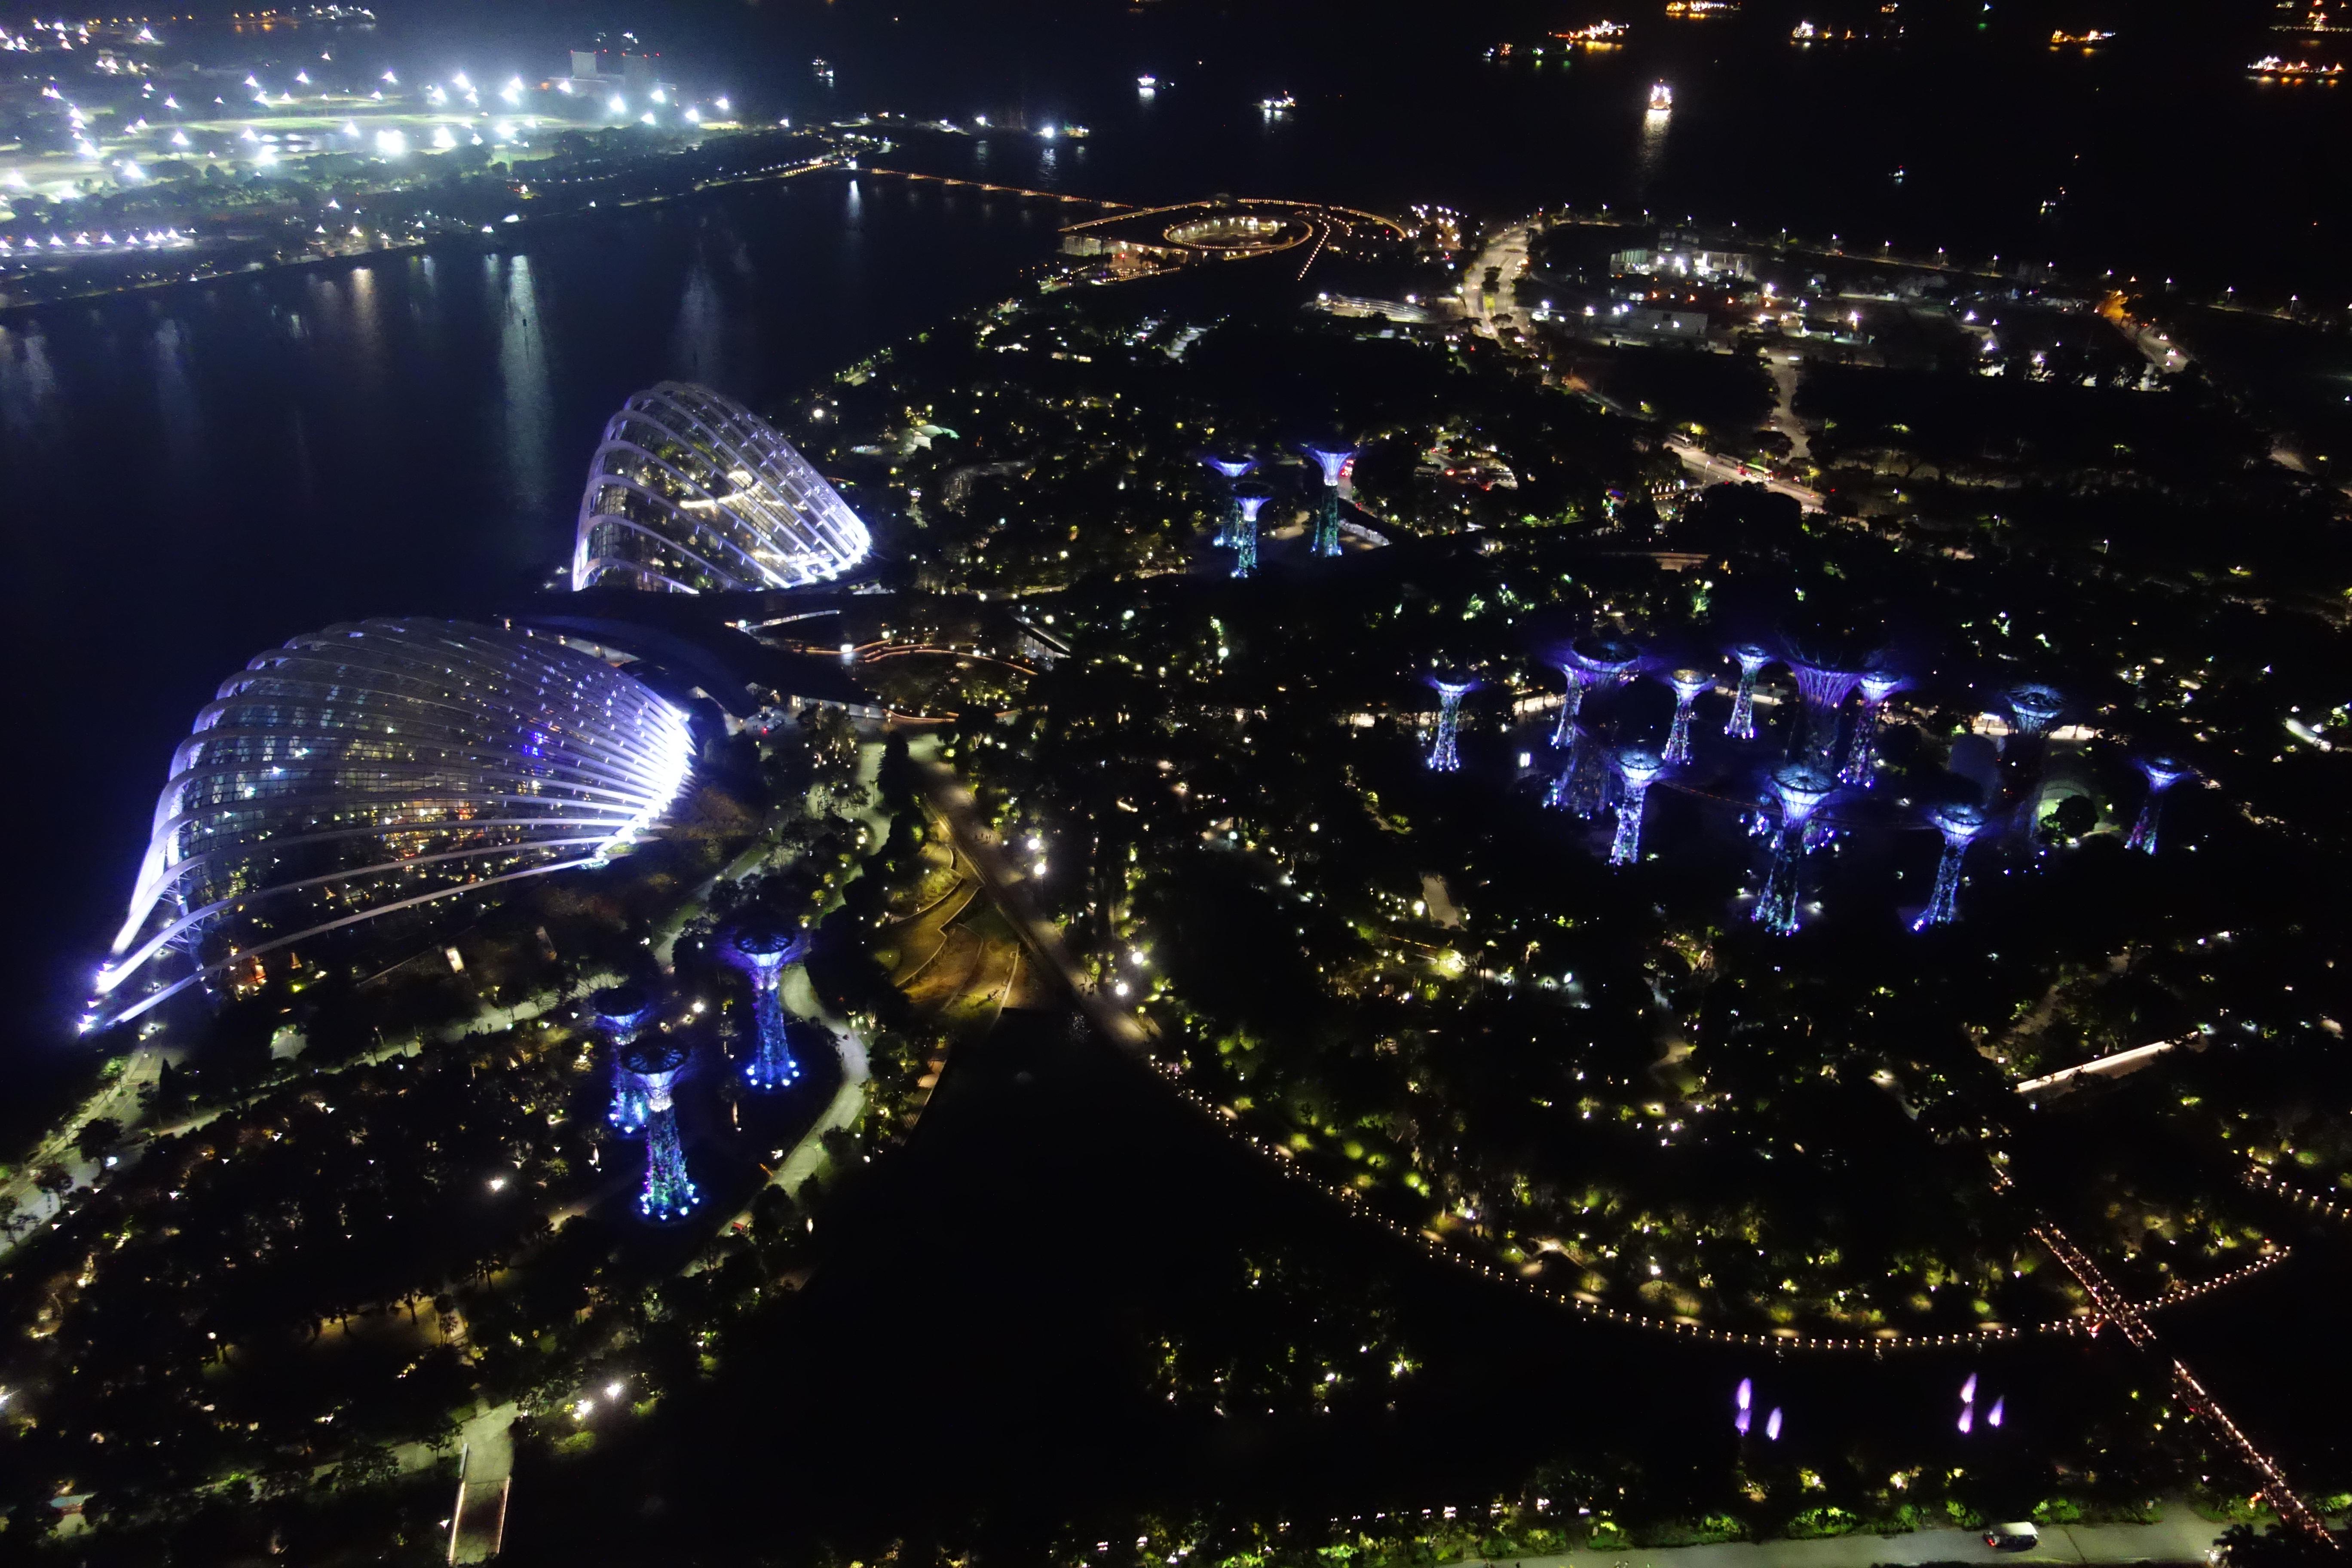 marina-bay-view-by-night-singapore